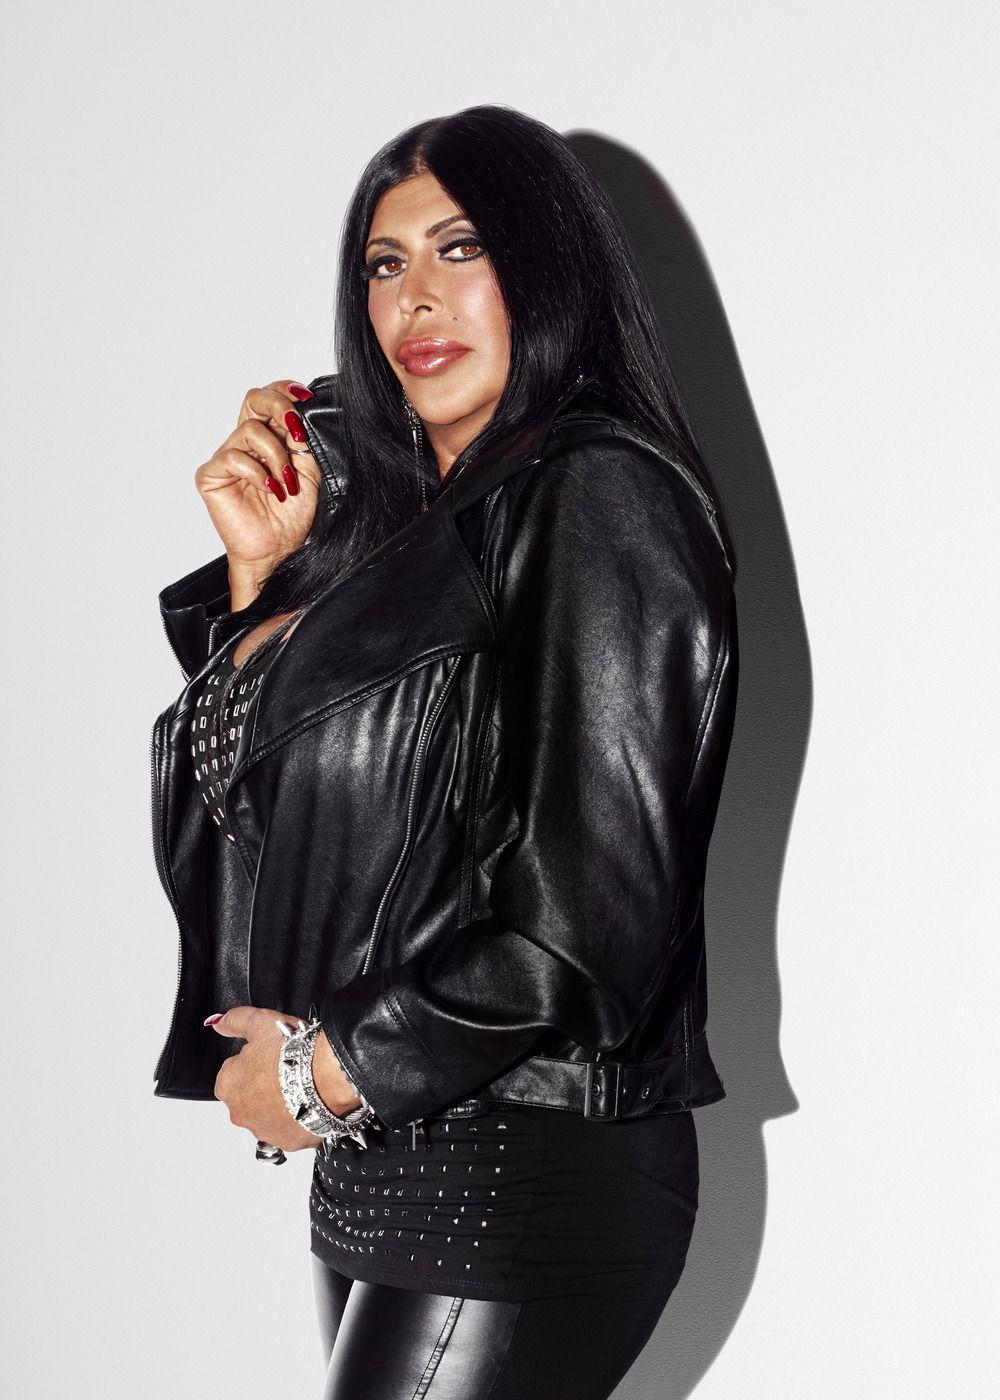 Angela Raiola Wikipedia big ang pre-plastic surgery: see the mob wives star back in